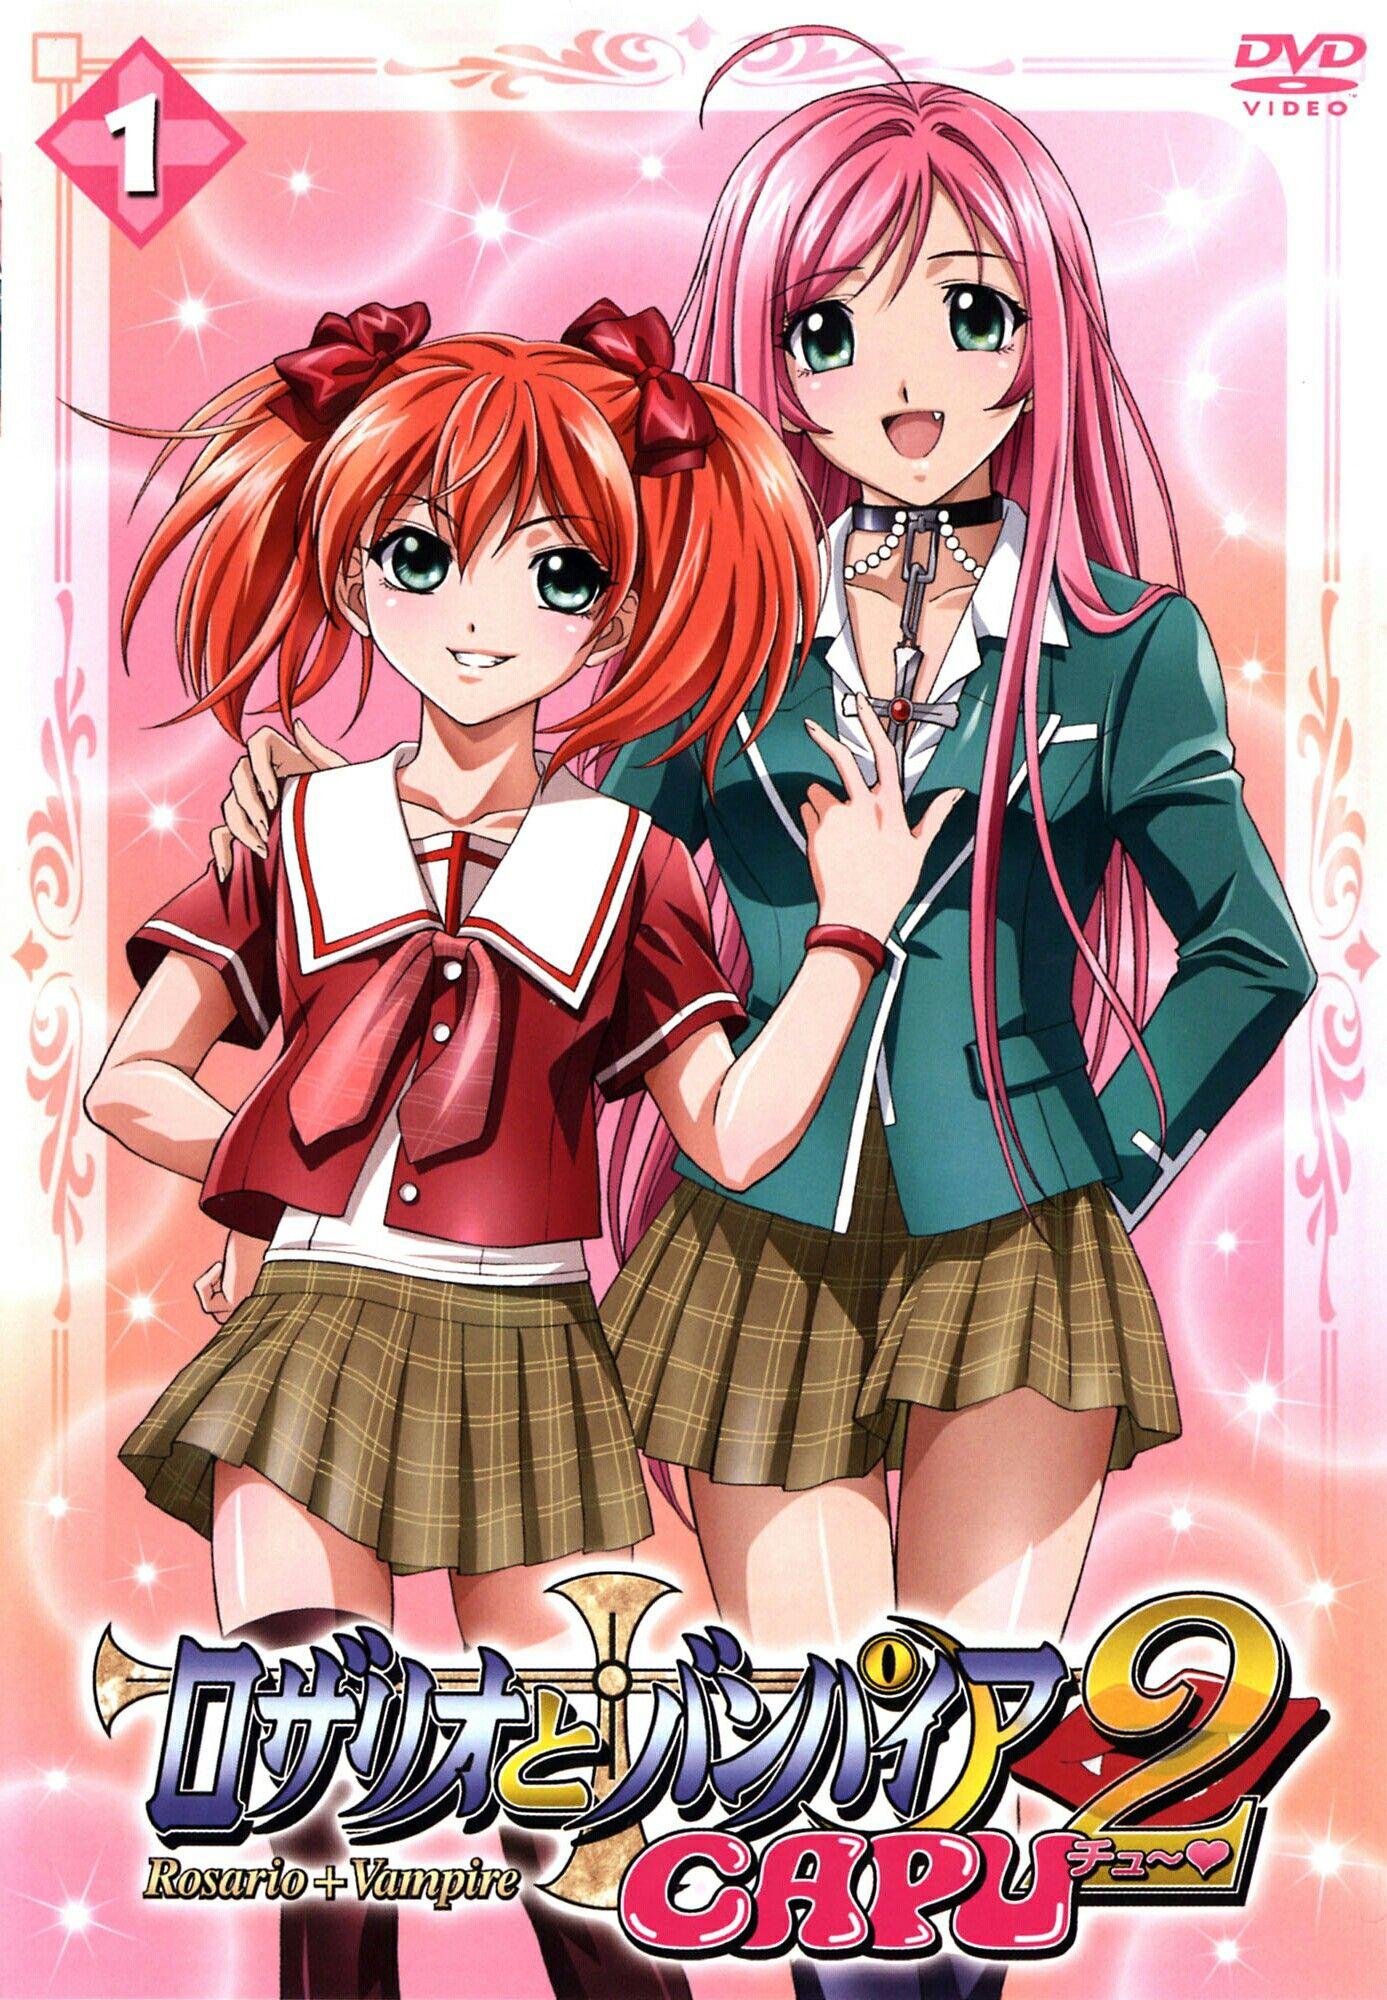 Pin By Kikecgn On Moka Rosario Vampire Anime Rosario